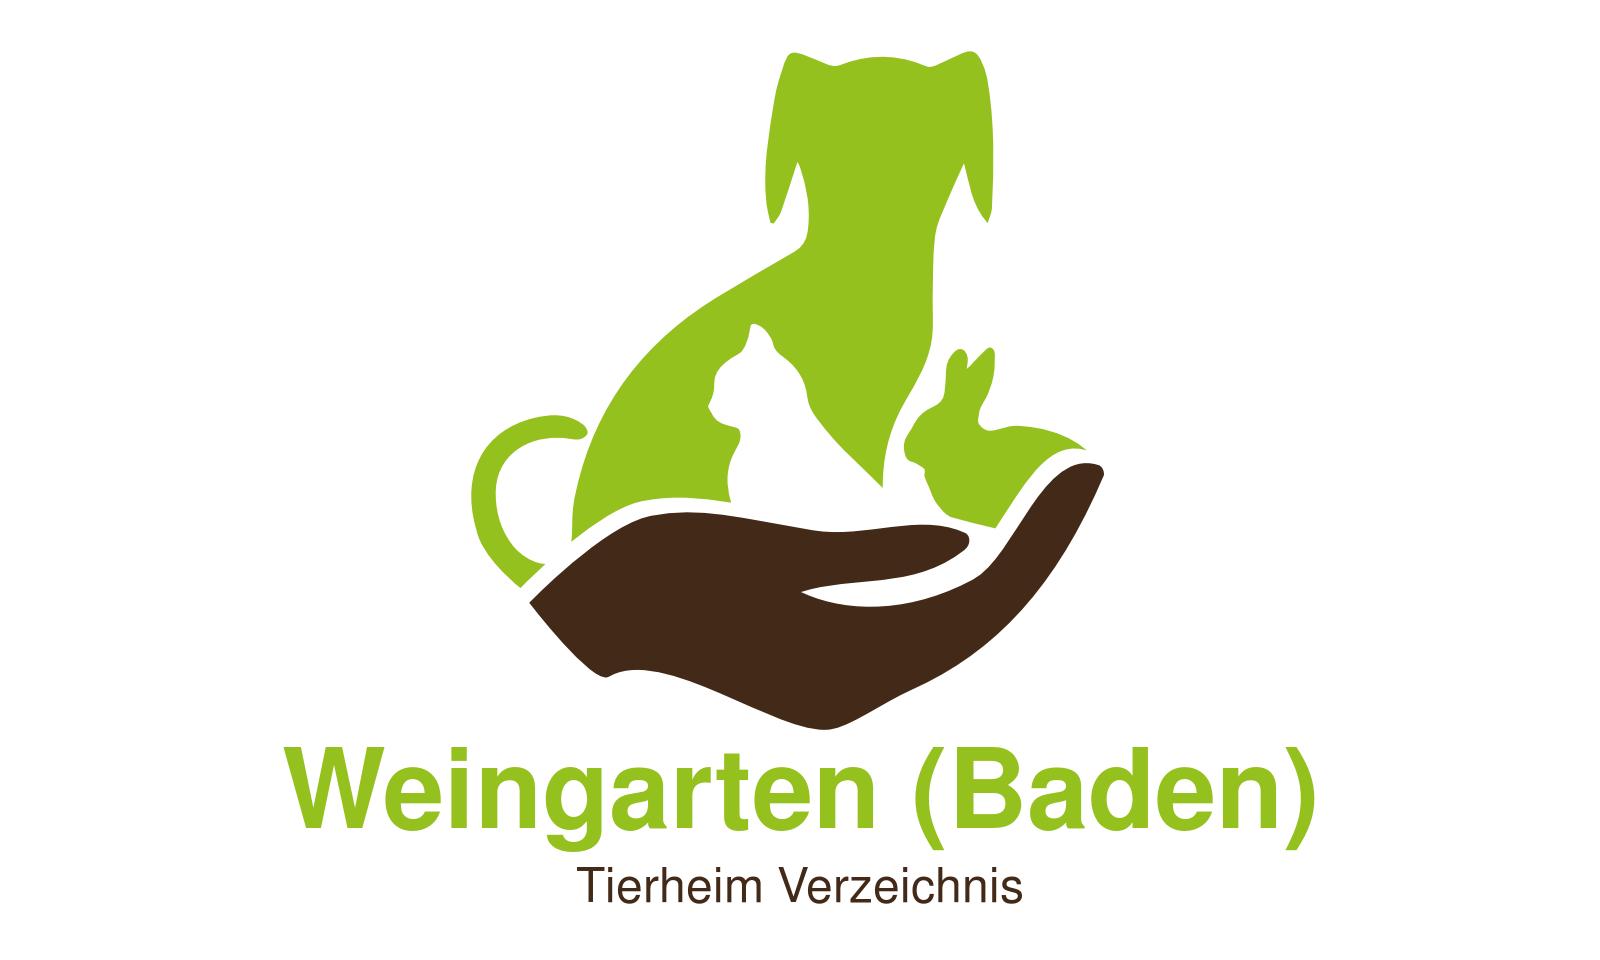 Tierheim Weingarten (Baden)